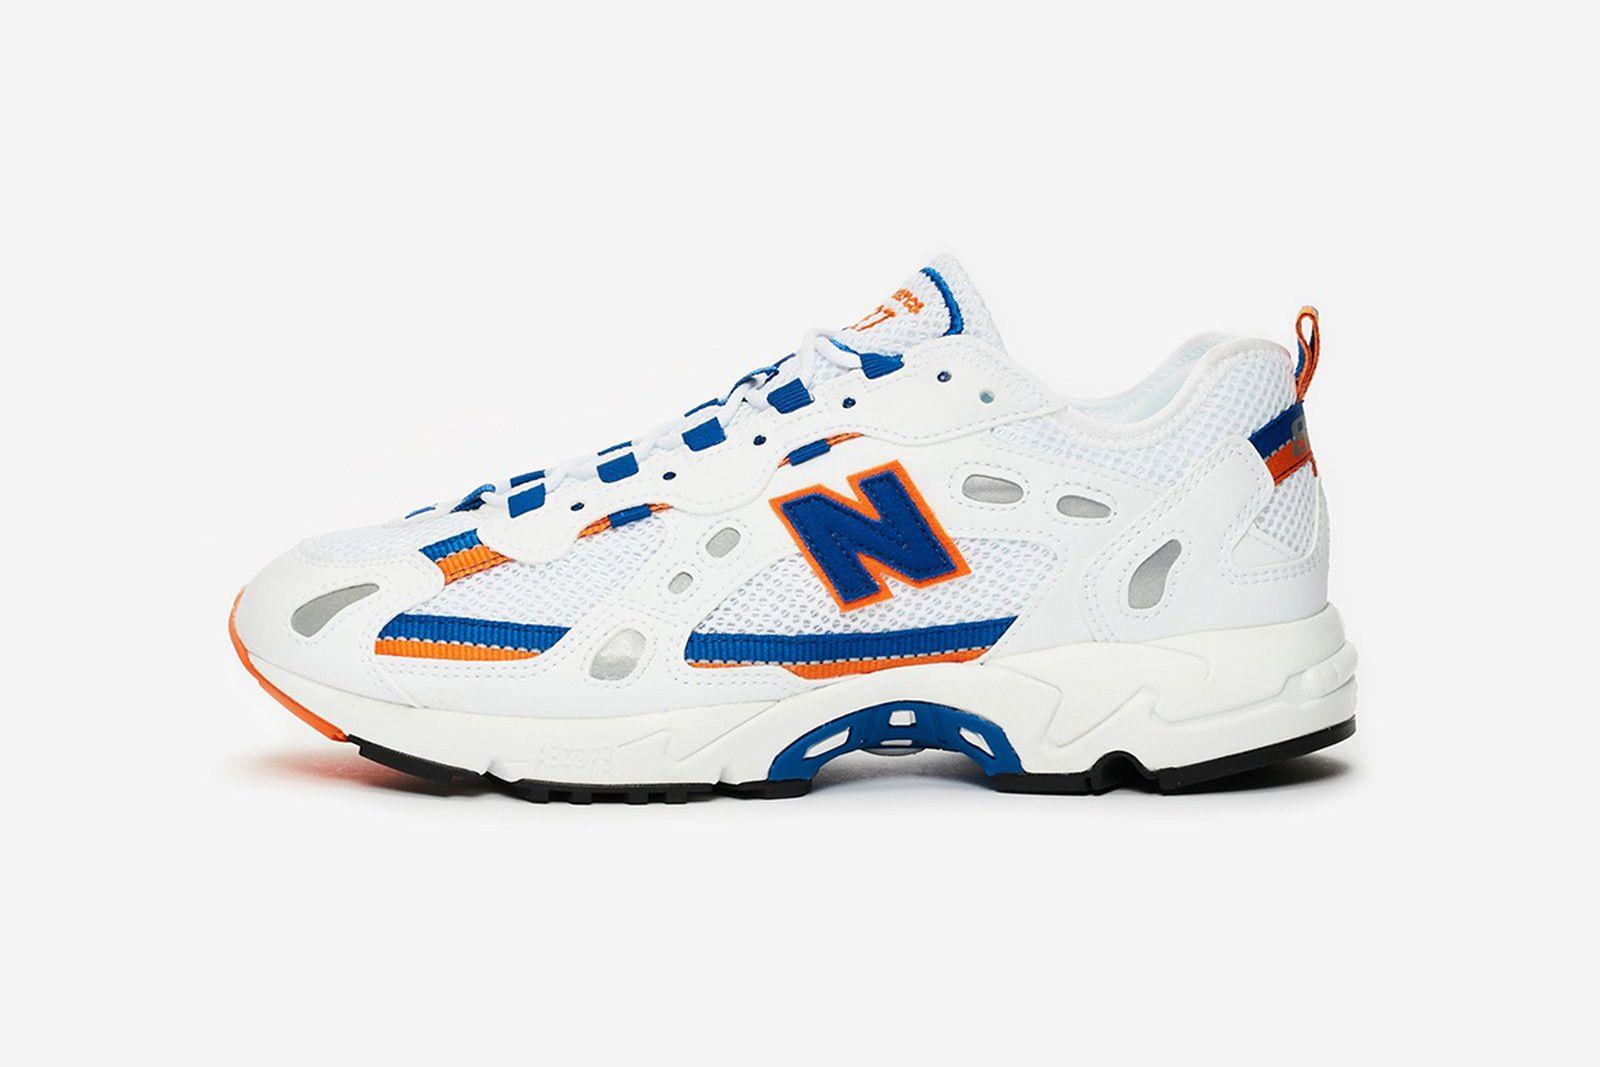 New Balance 827 Spring 2020